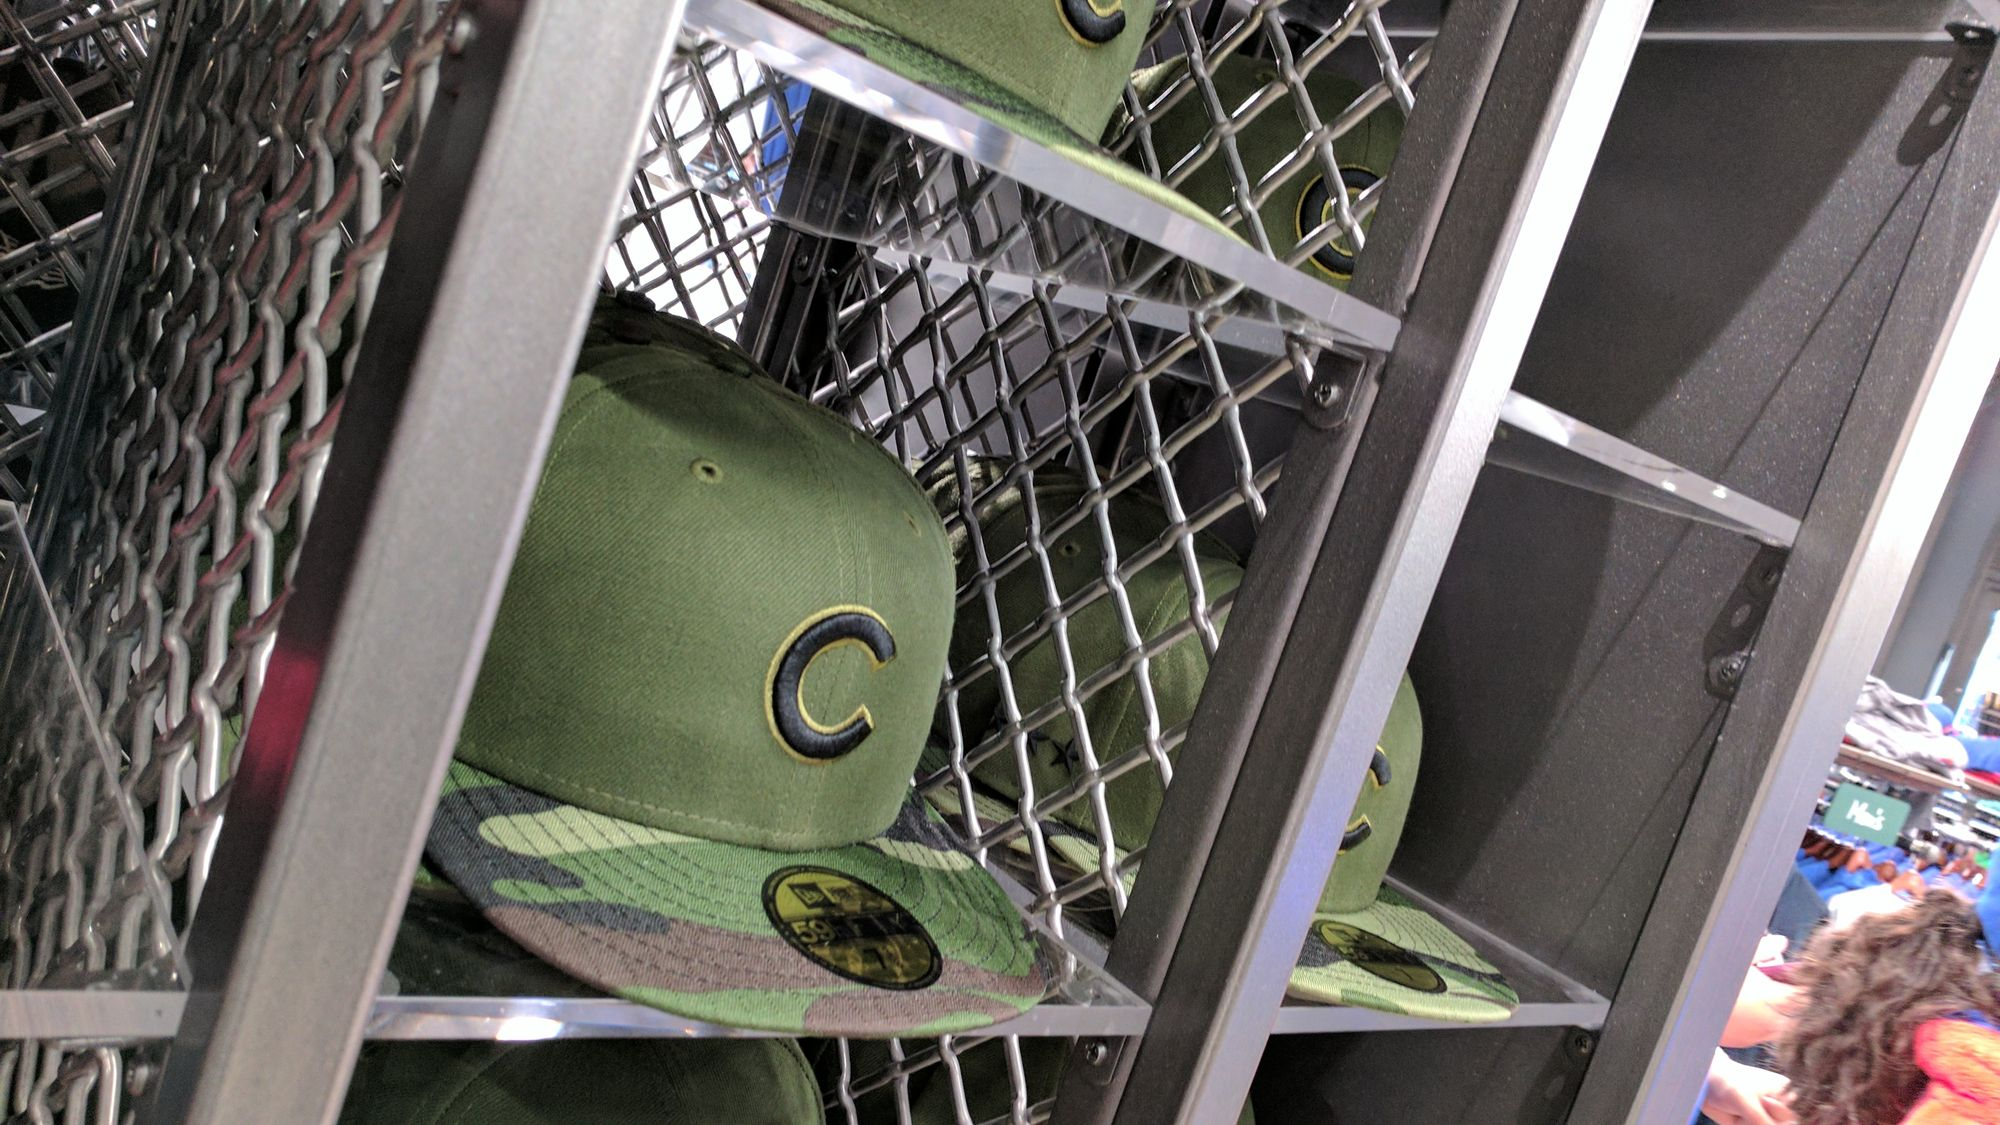 Lock Crimp Wire Mesh in Cubs team store